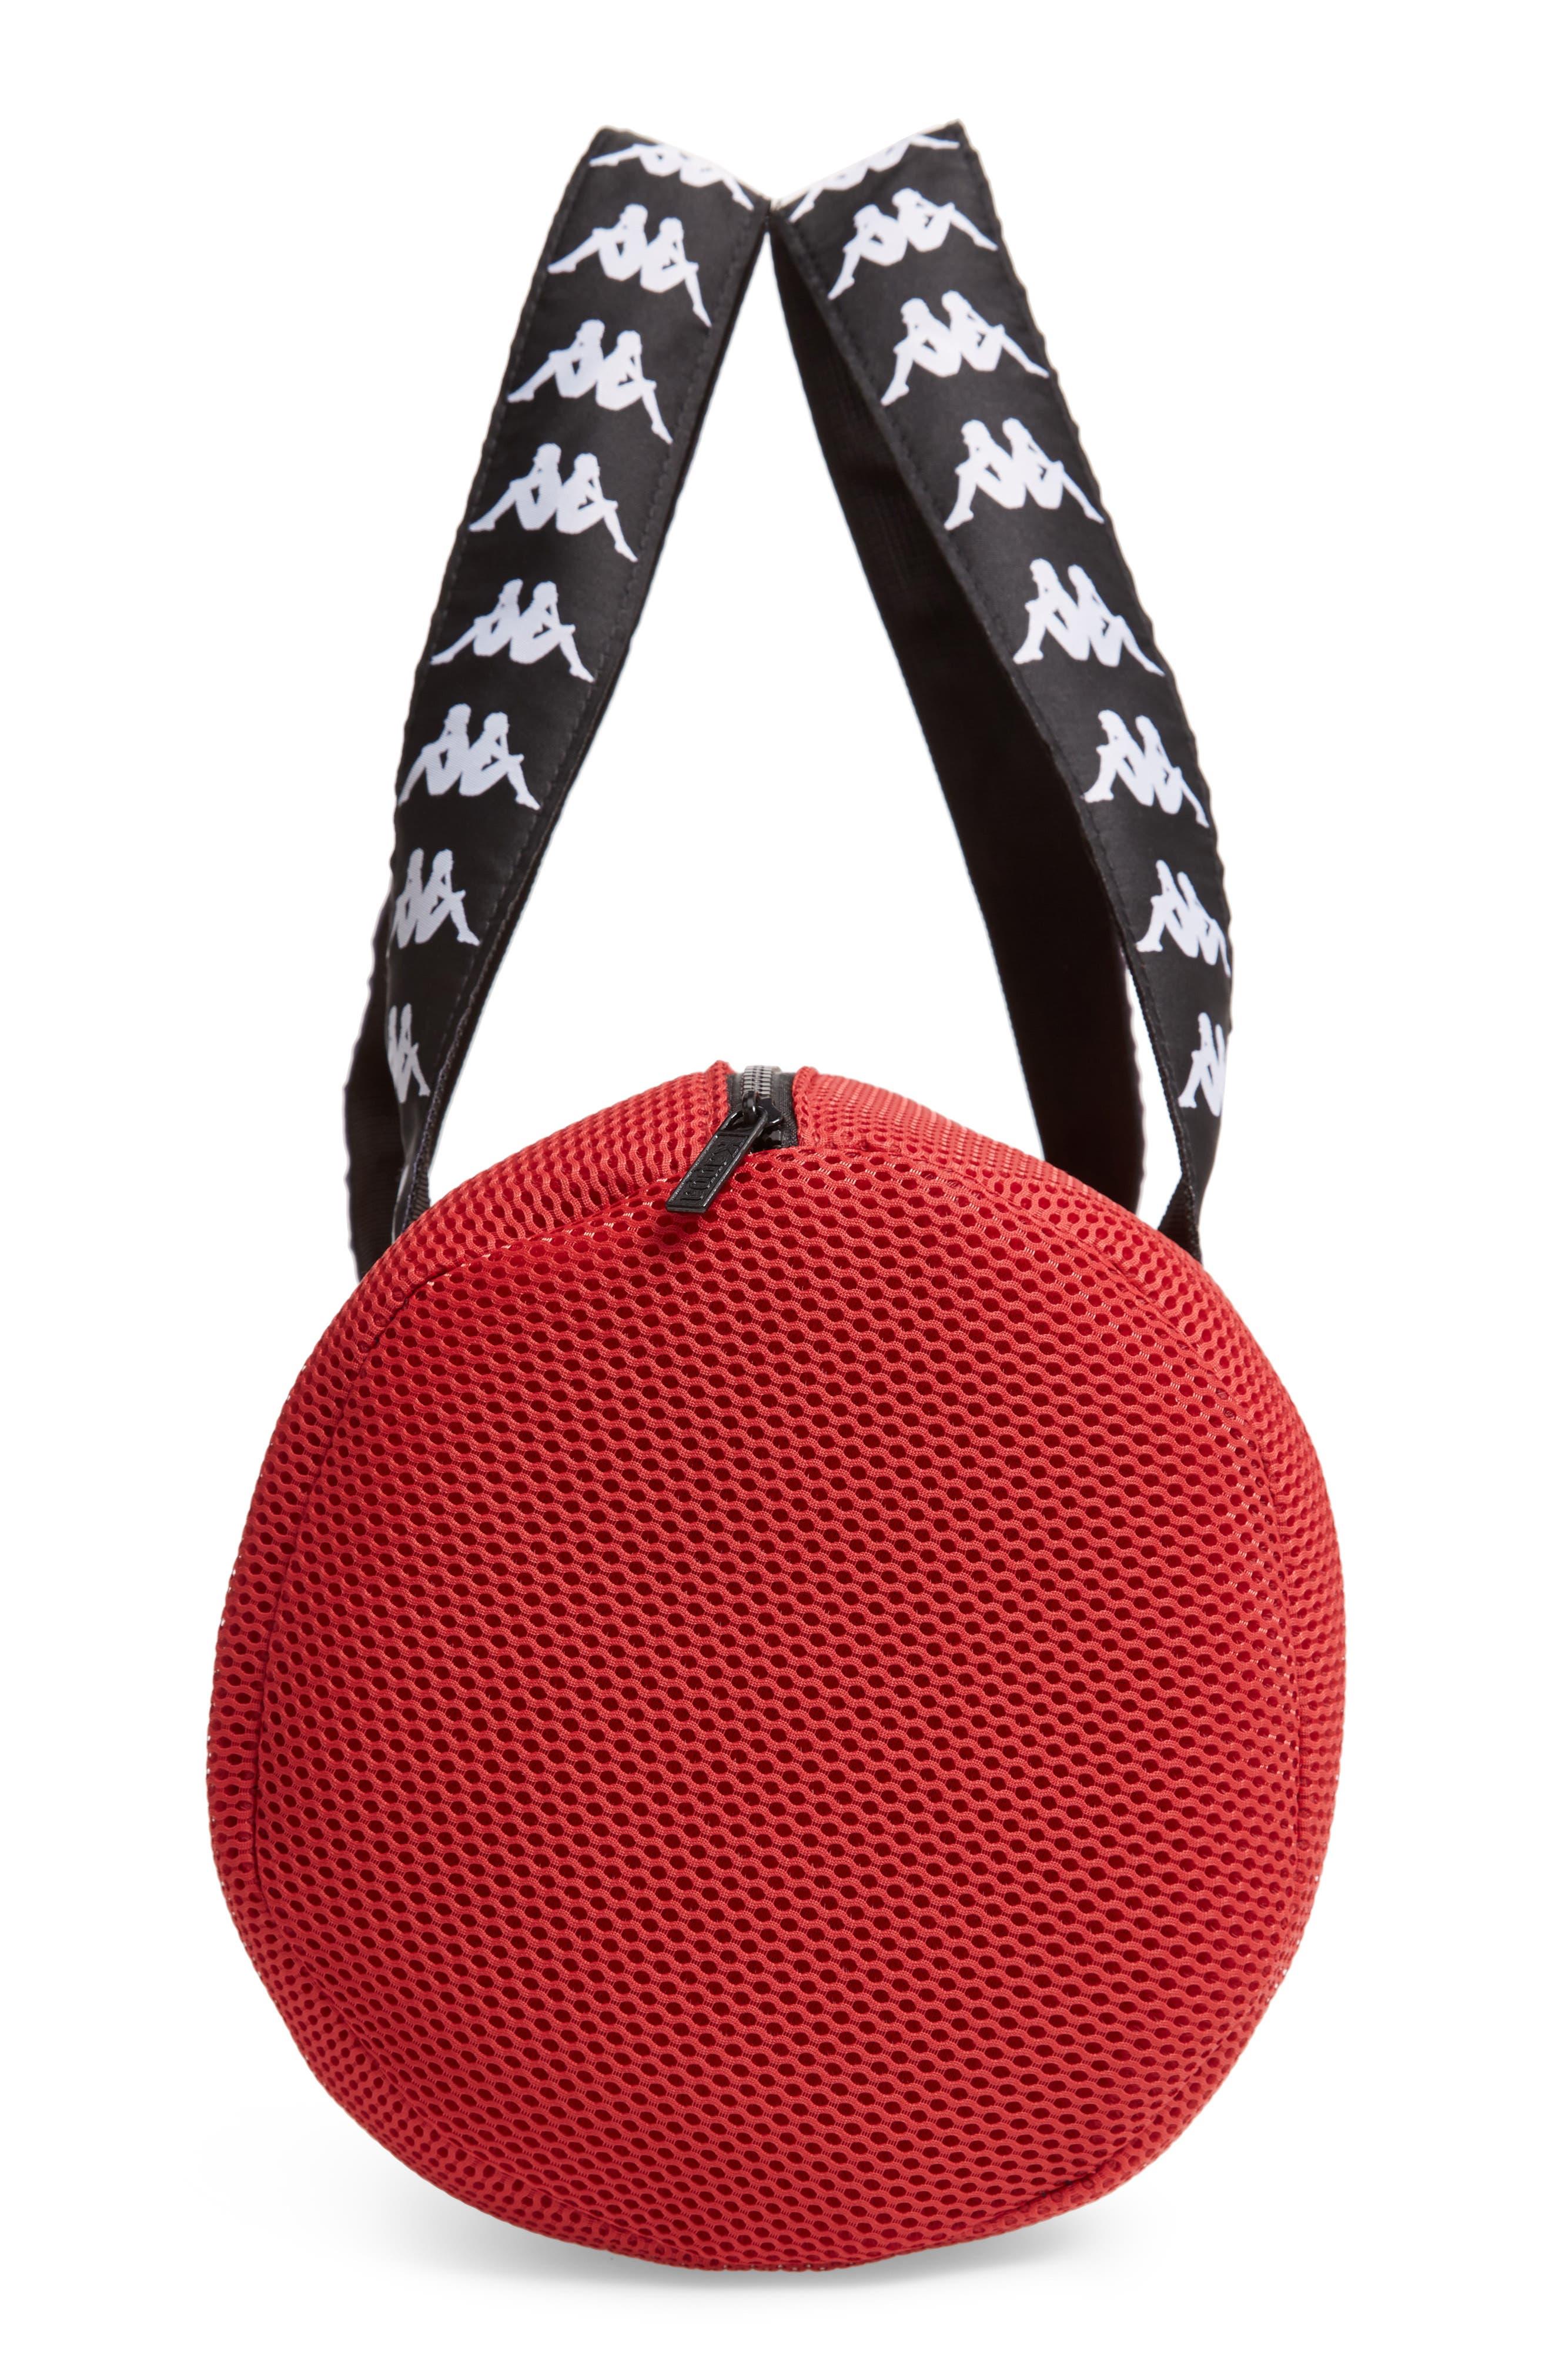 Large Mesh Athletic Duffel Bag,                             Alternate thumbnail 5, color,                             RED DK-BLACK-WHITE